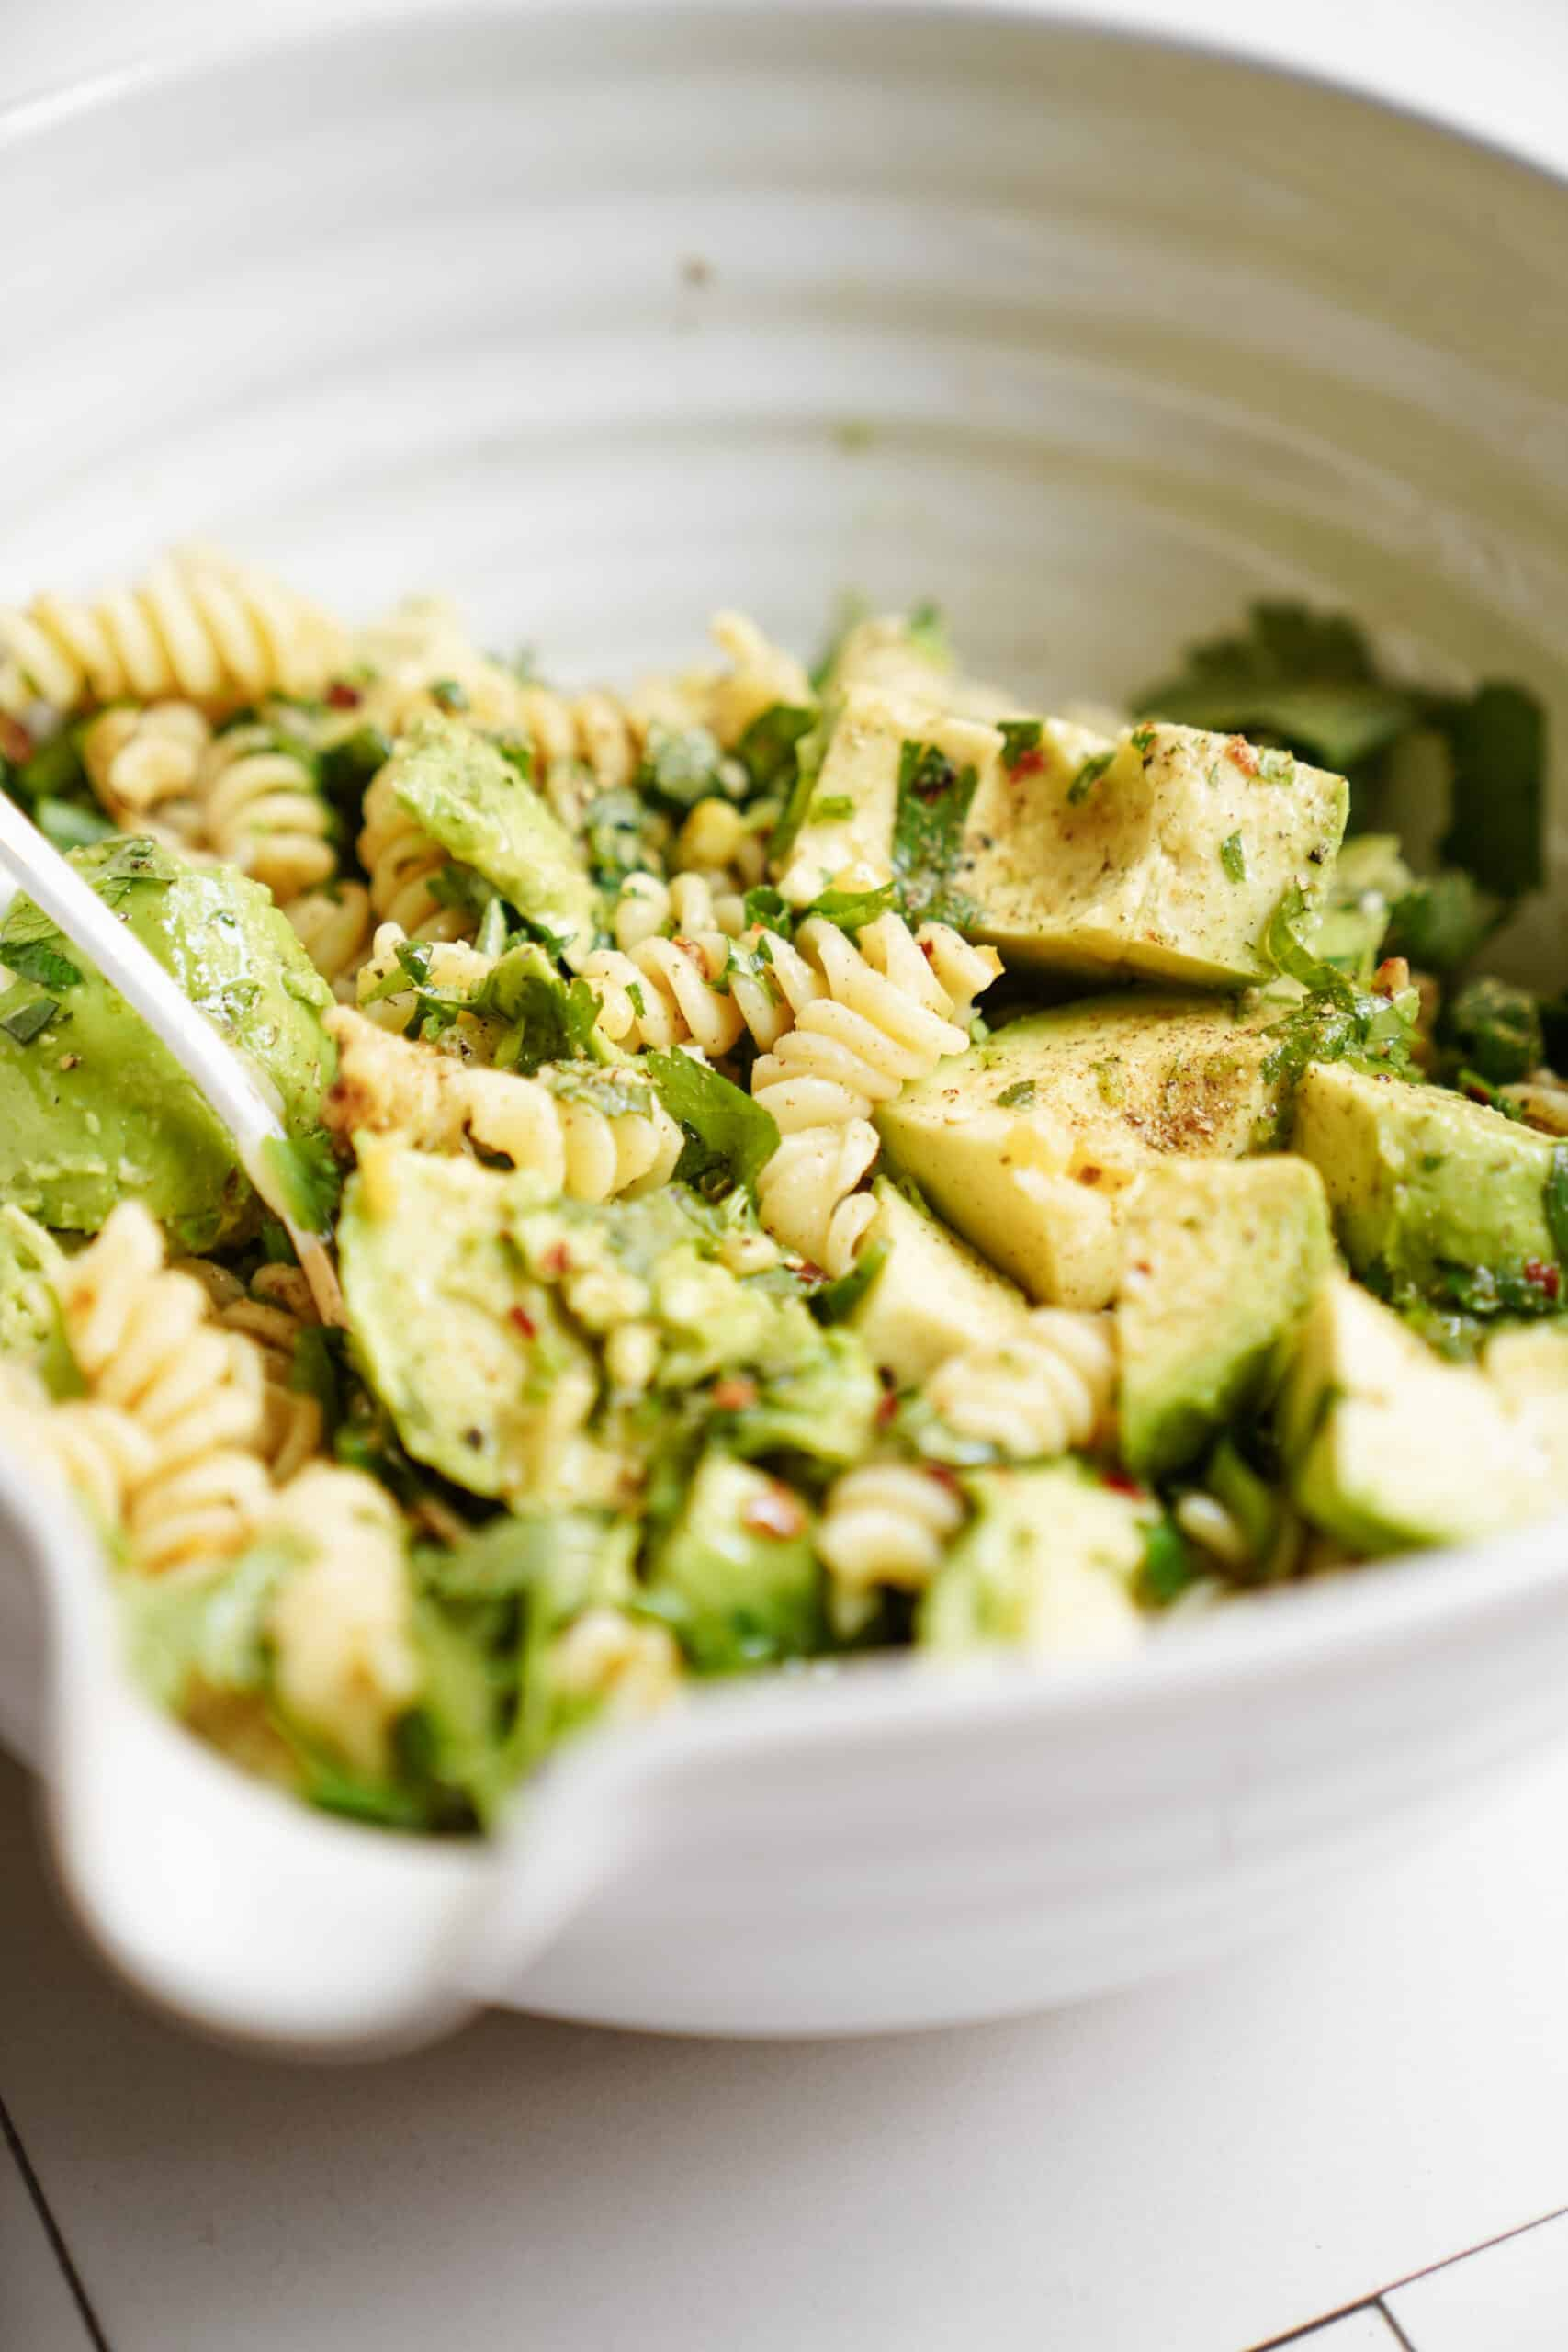 avocado pasta salad close-up in bowl